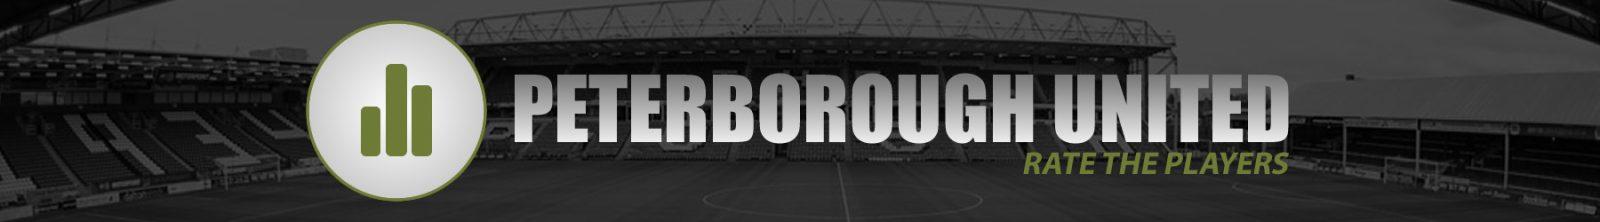 Rate Peterborough United